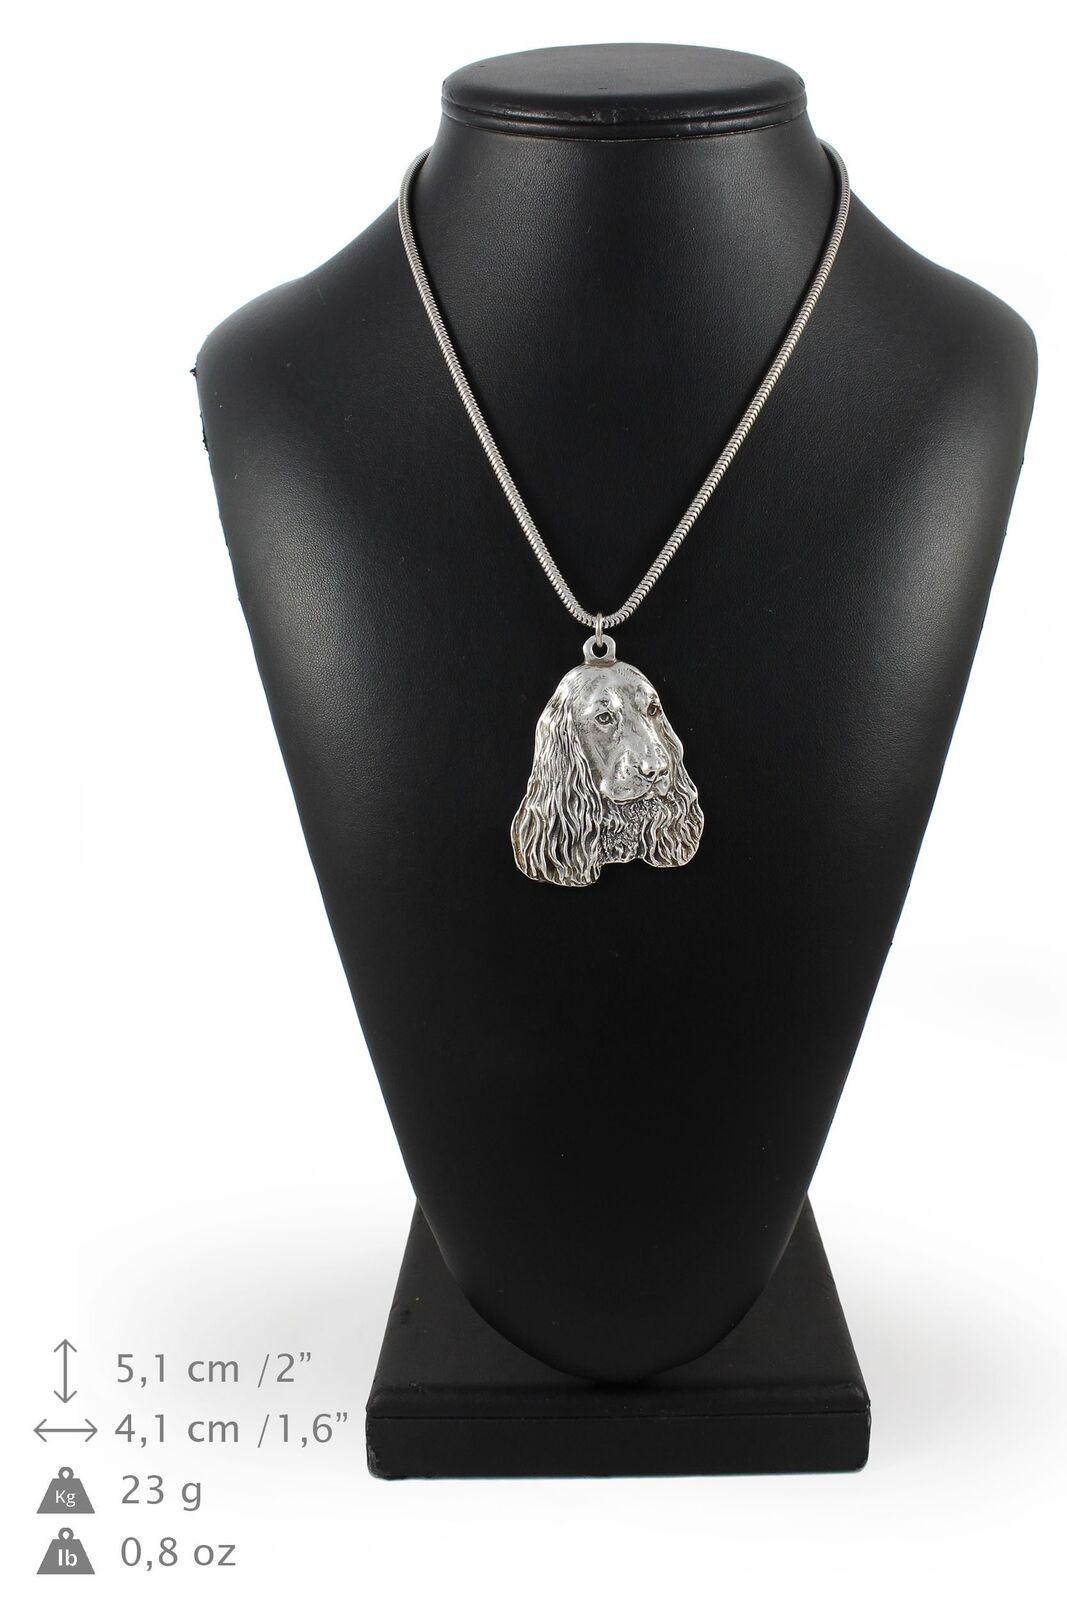 Cocker spaniel - collier en silver plaqué sur une chaîne en silver Art Dog FR